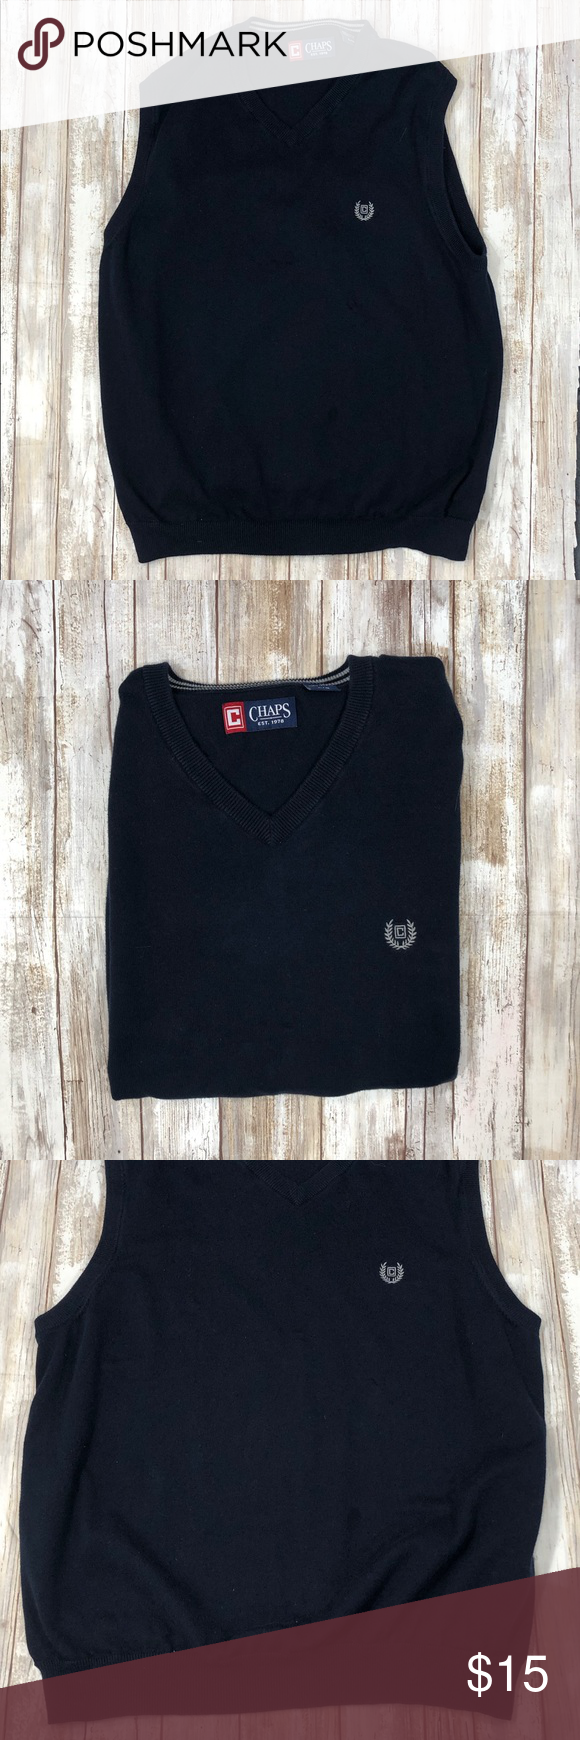 7ffe353f ⚒Men's vest CHAPS Golf sweater style size Large Very nice men's sweater  vest size Large